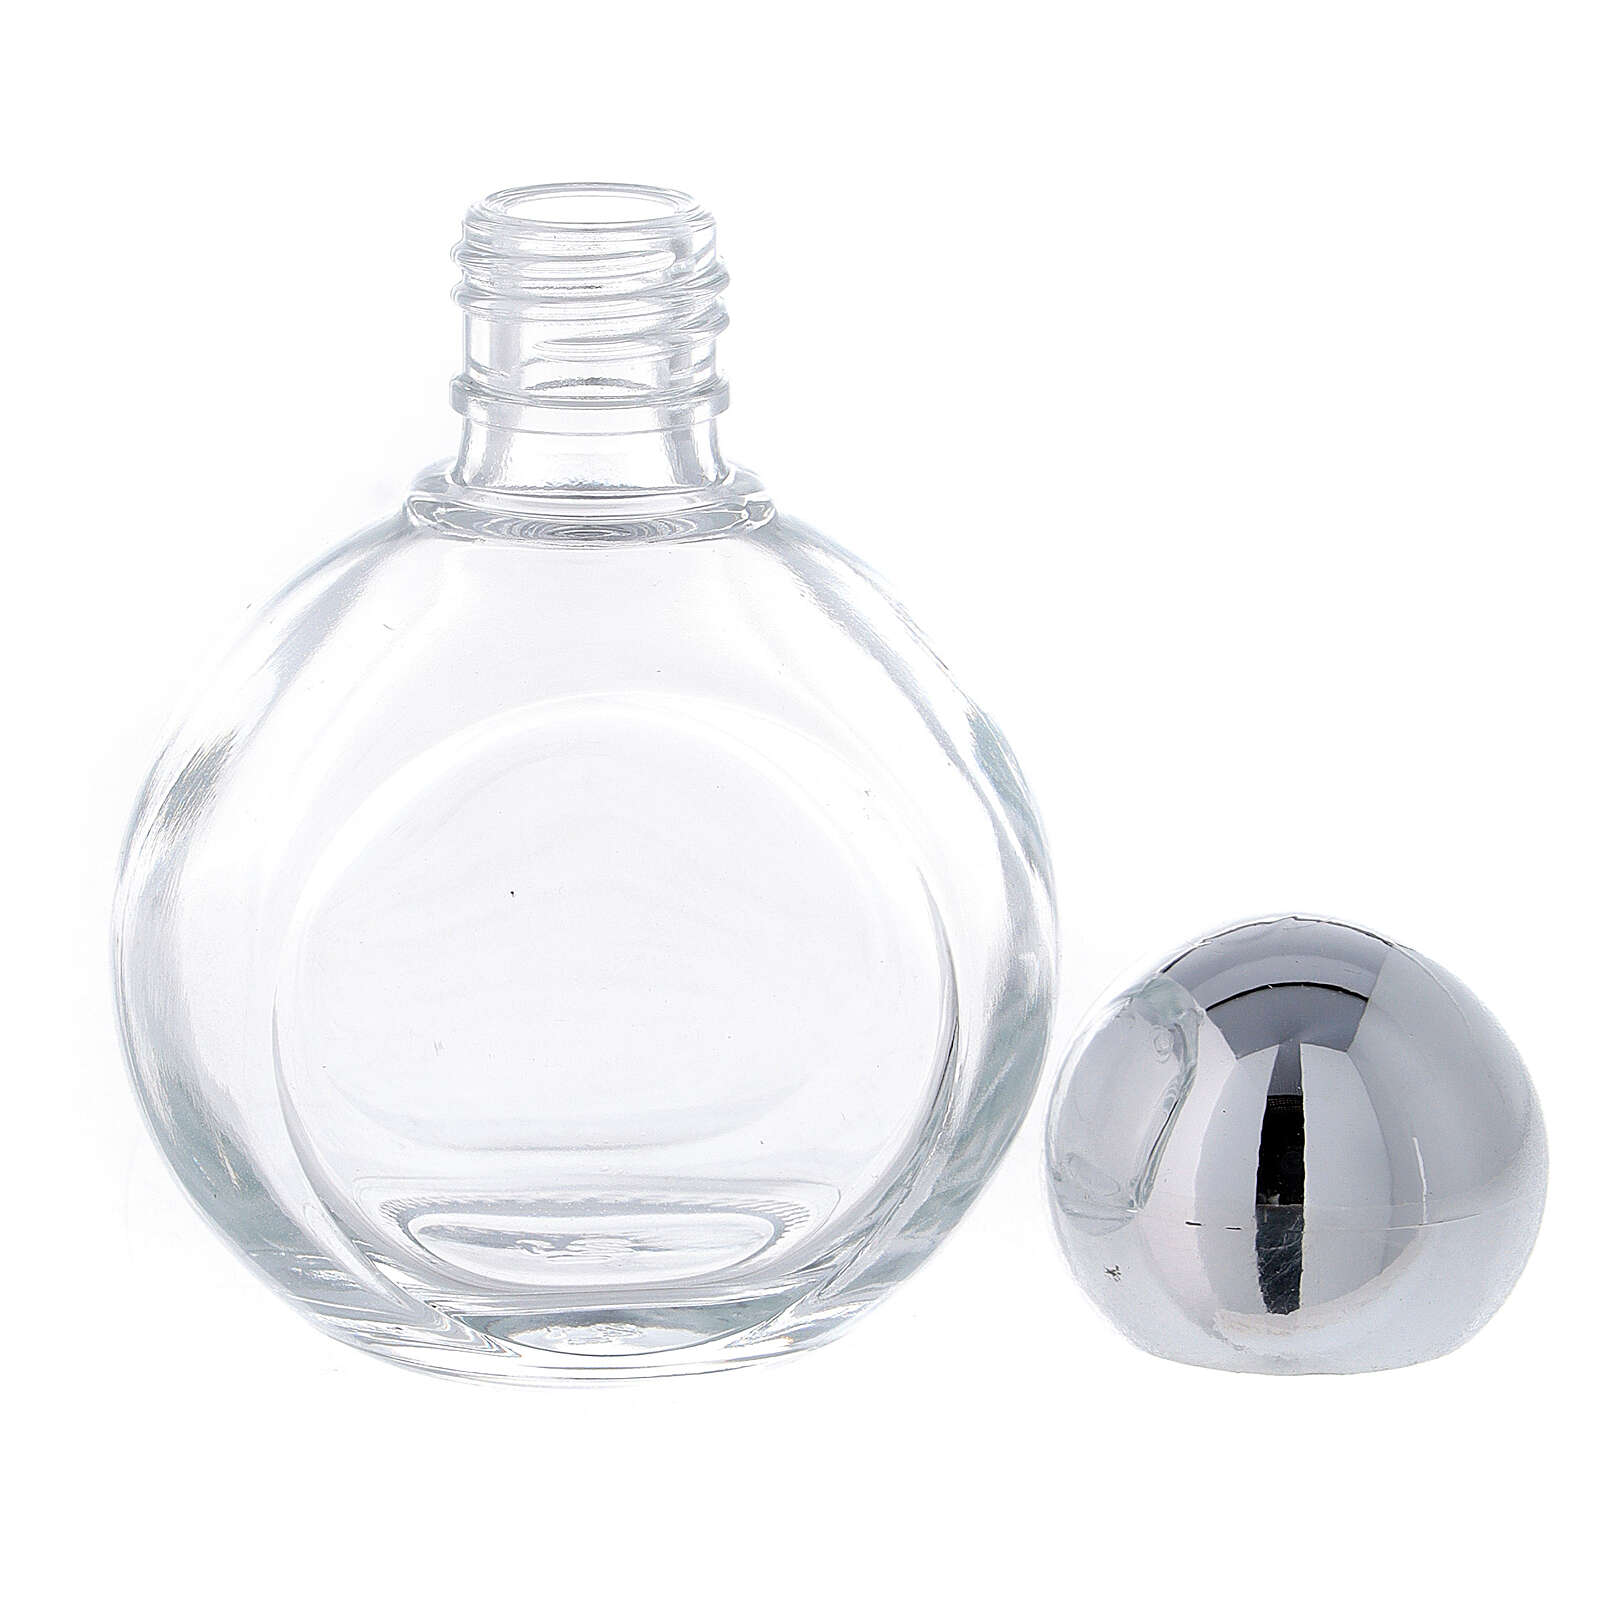 Botella agua bendita 35 ml de vidrio (CAJA 50 PIEZAS) 3